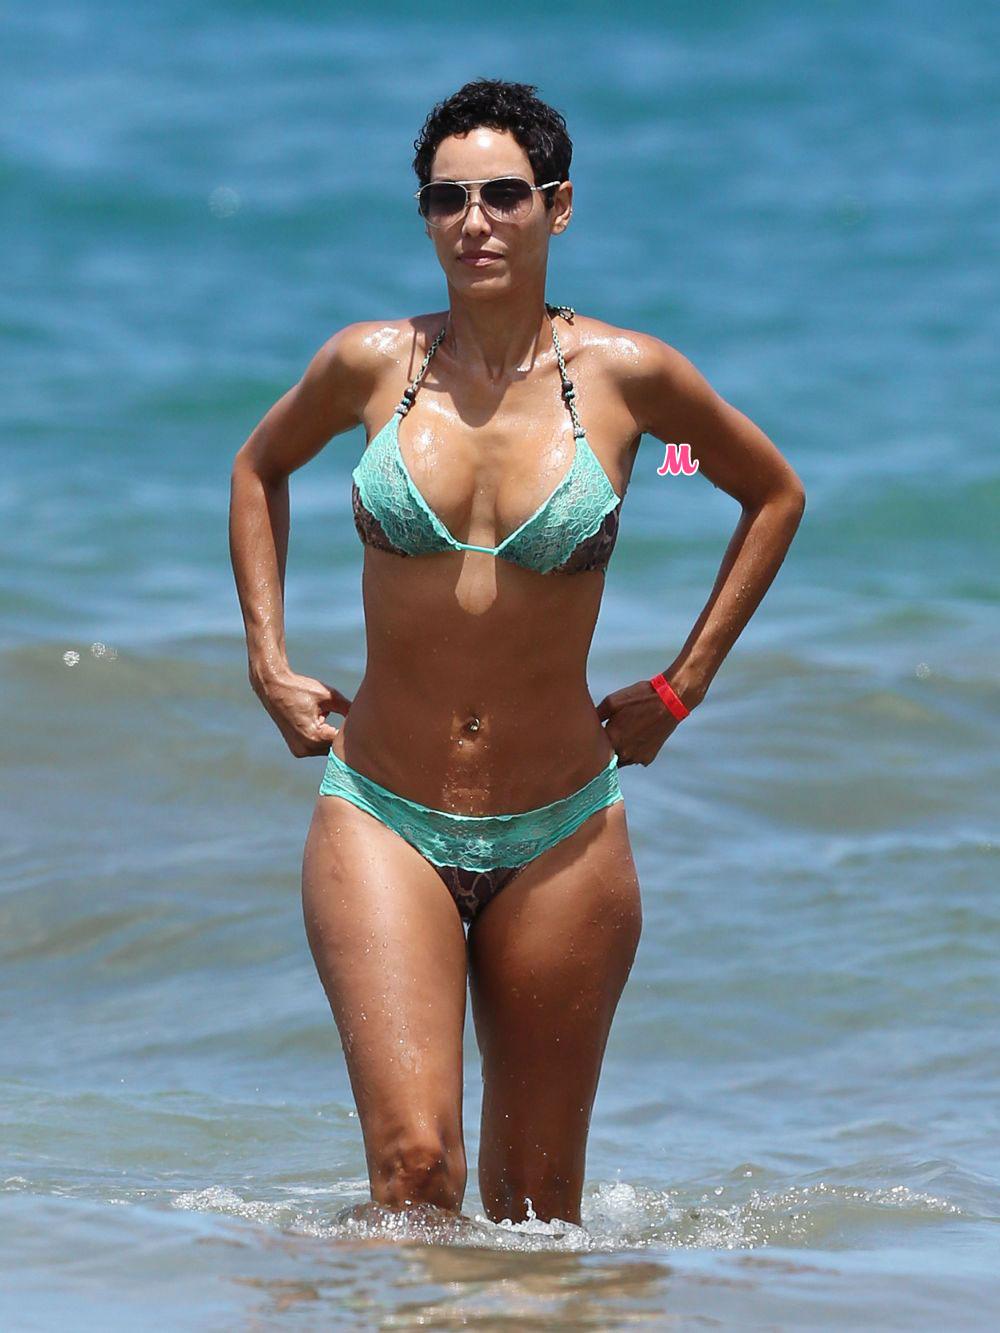 Bikini nude model sport